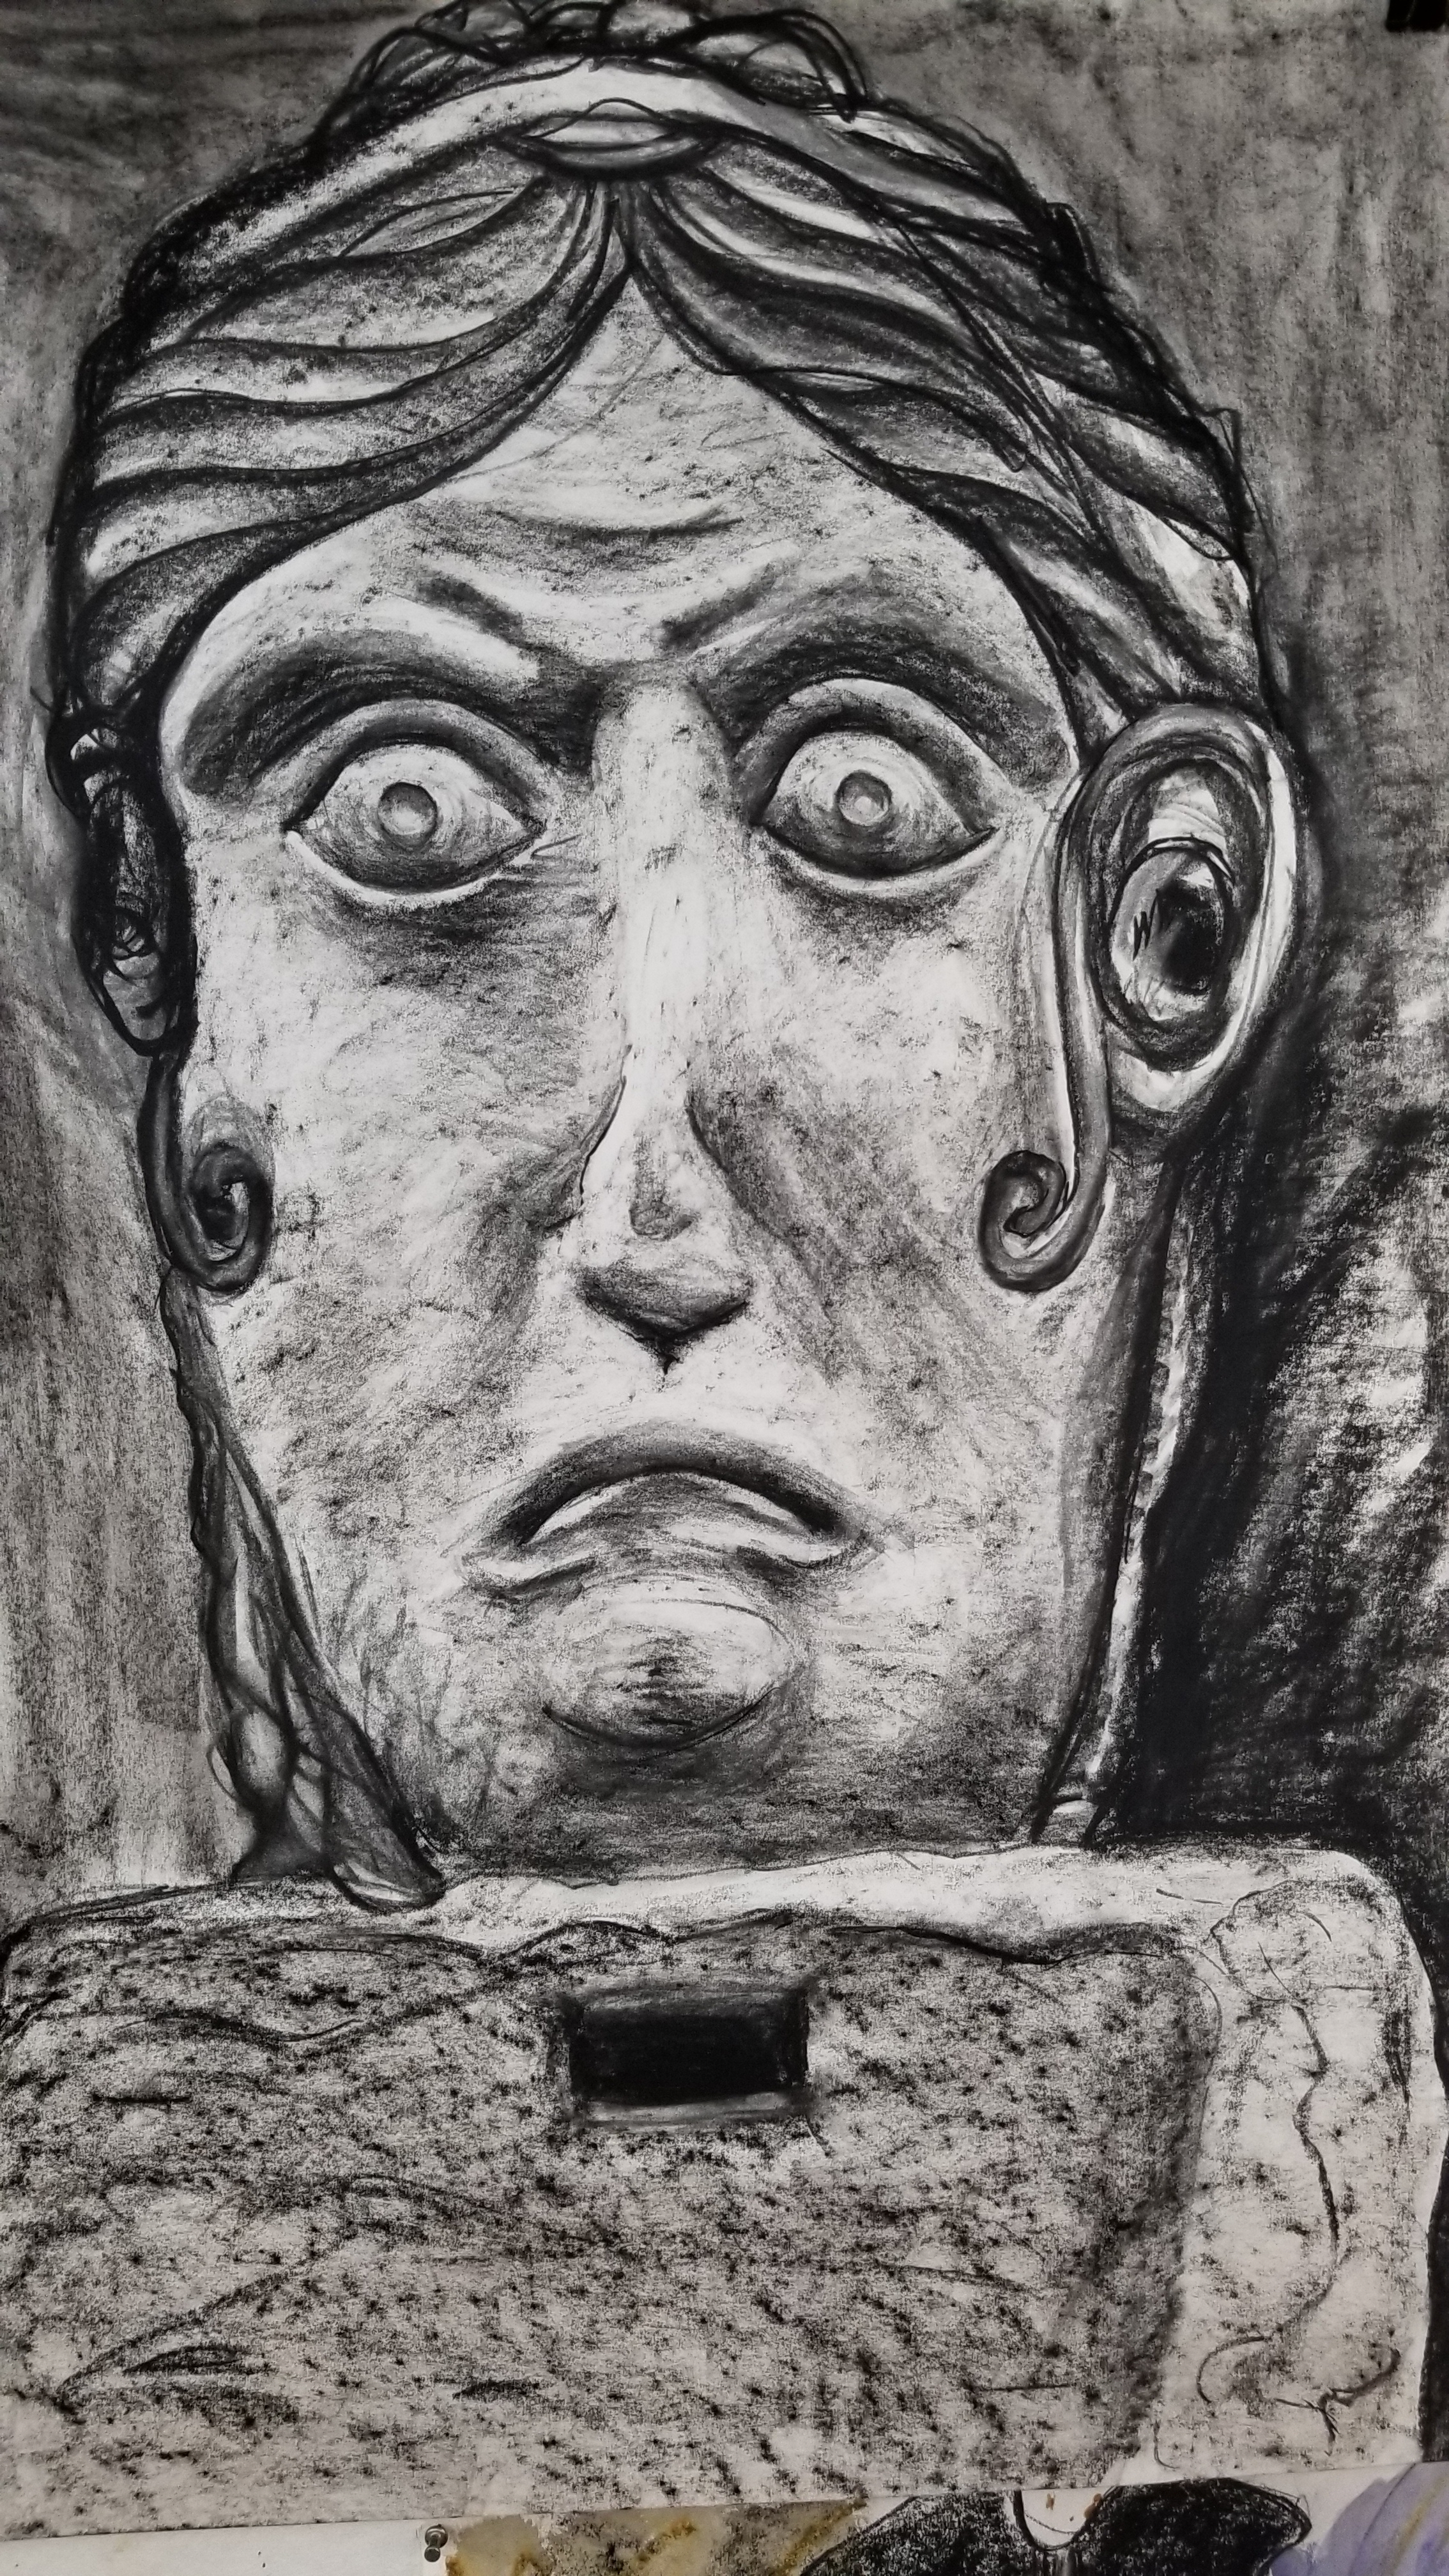 D. Wolfe, Stone Female Head